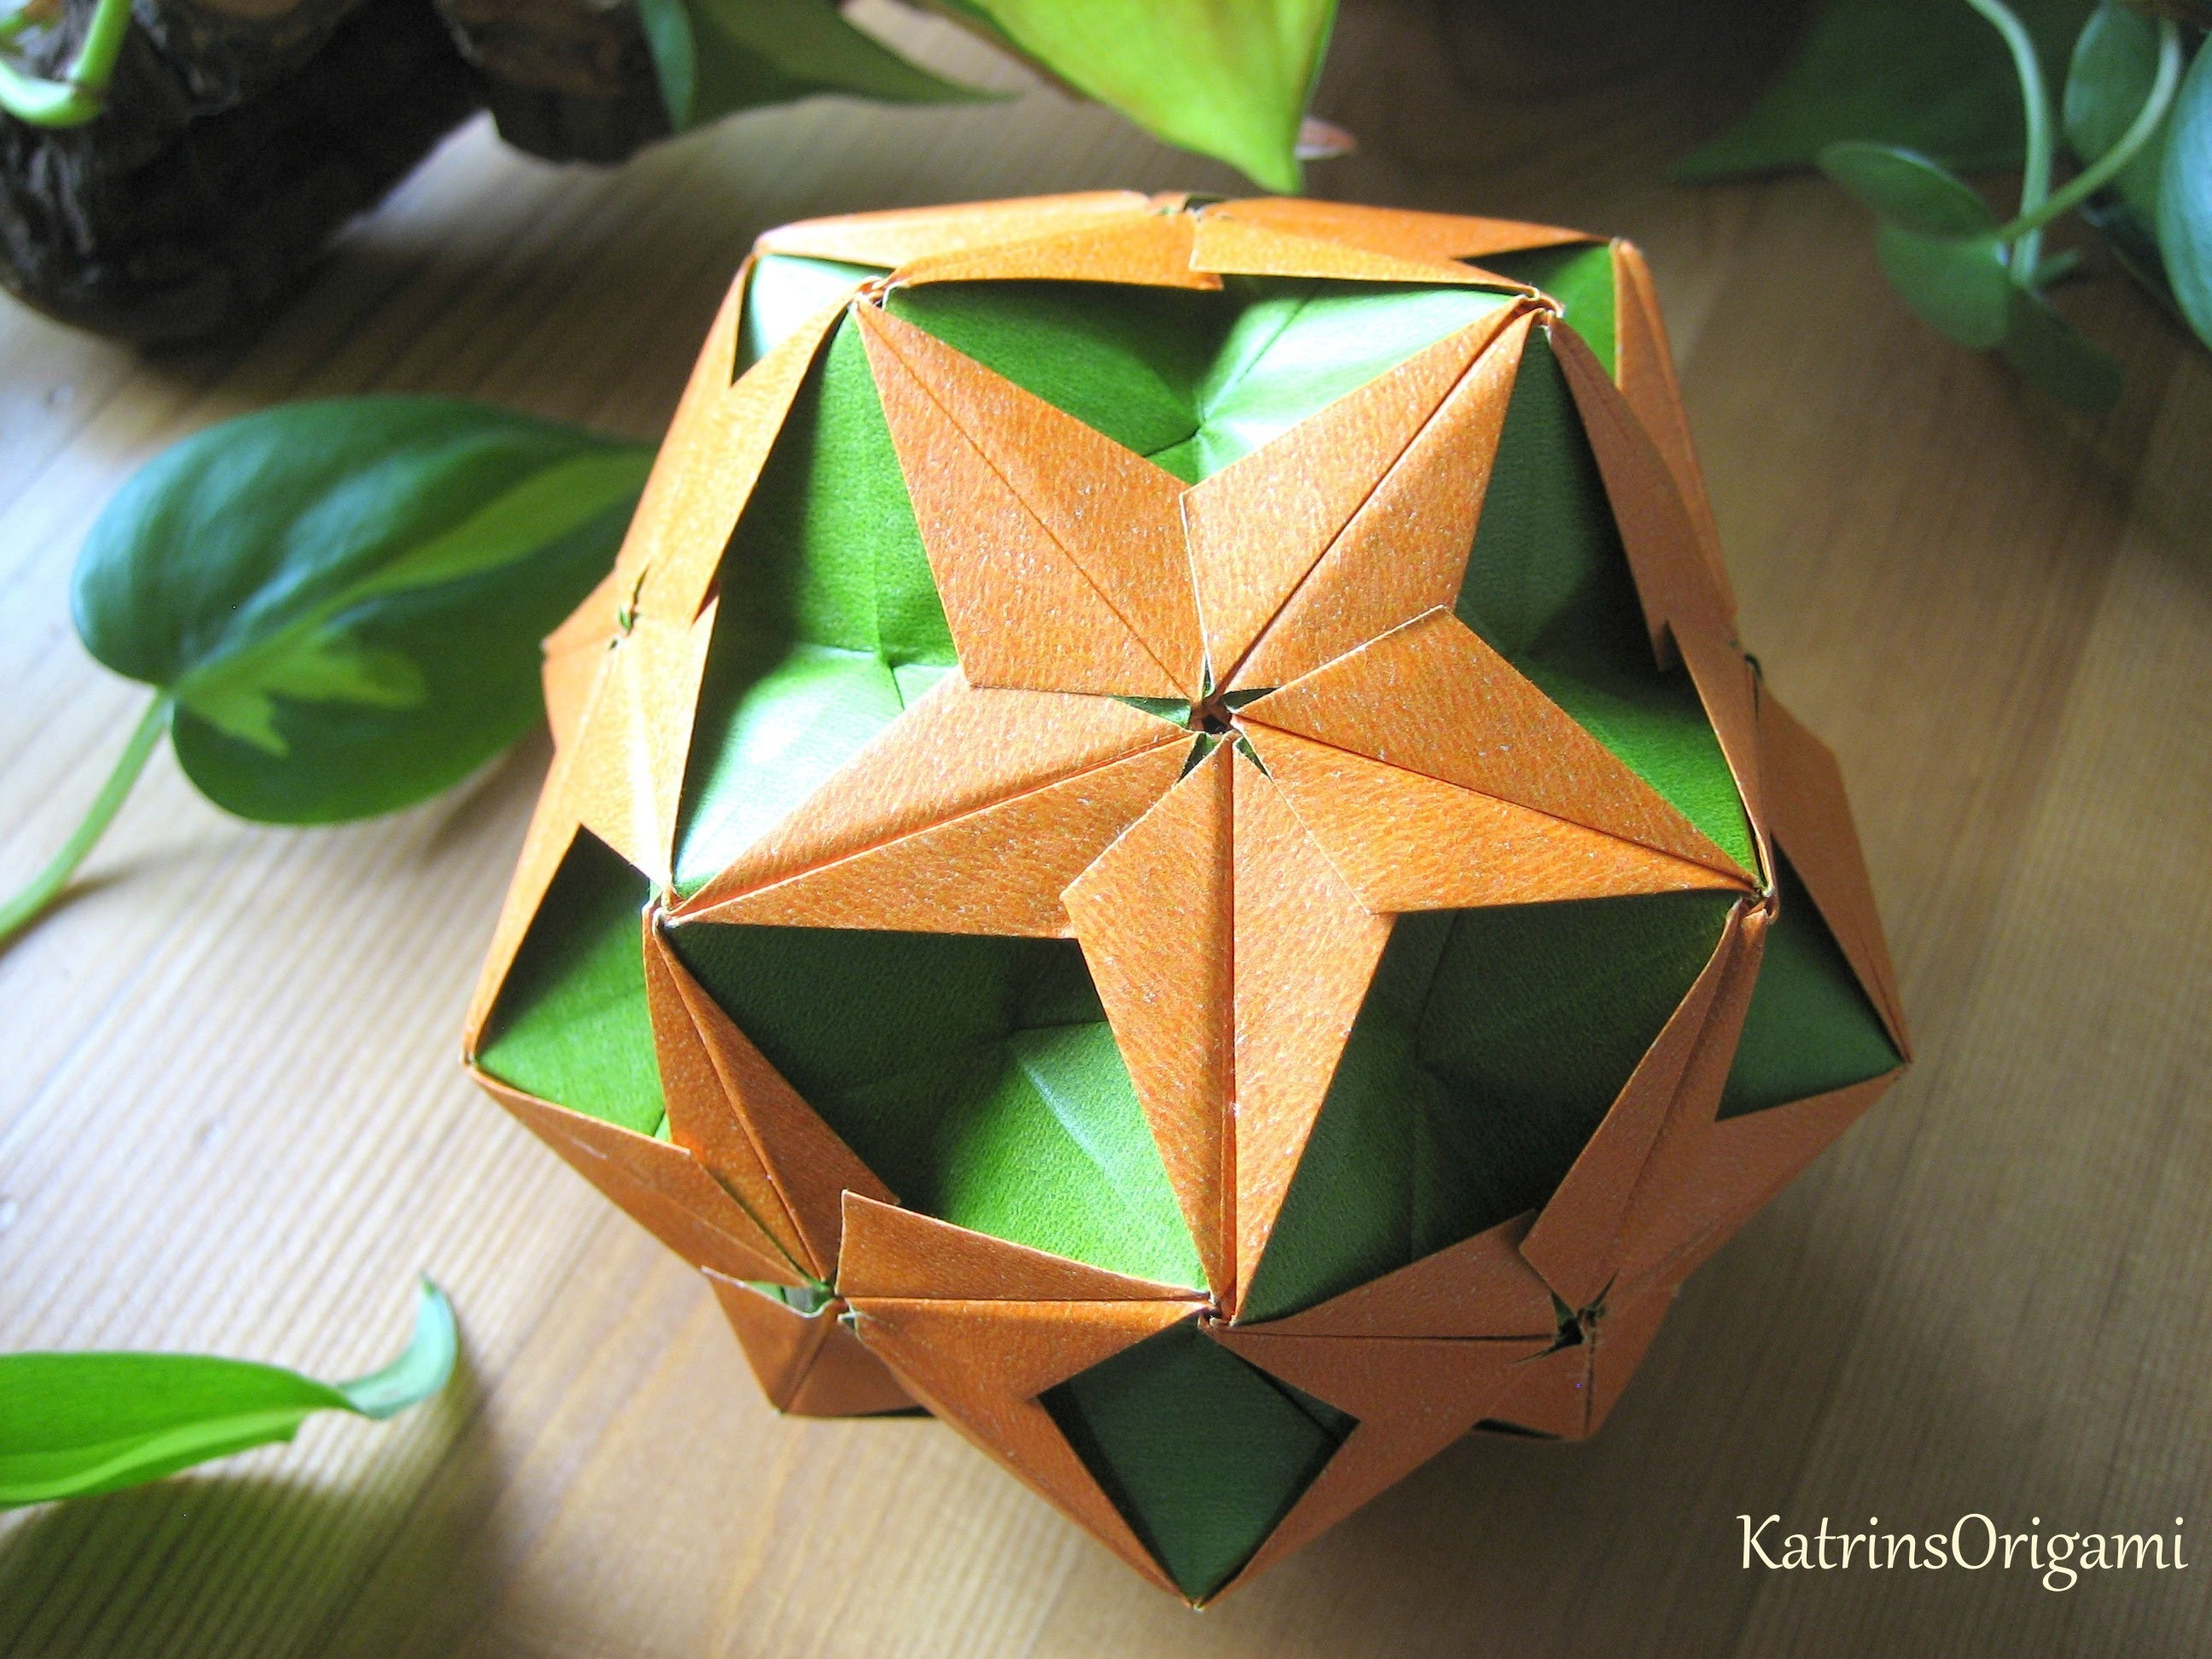 Origami origami chamomile star kusudama weihnachtsdeko - Origami weihnachtsdeko ...